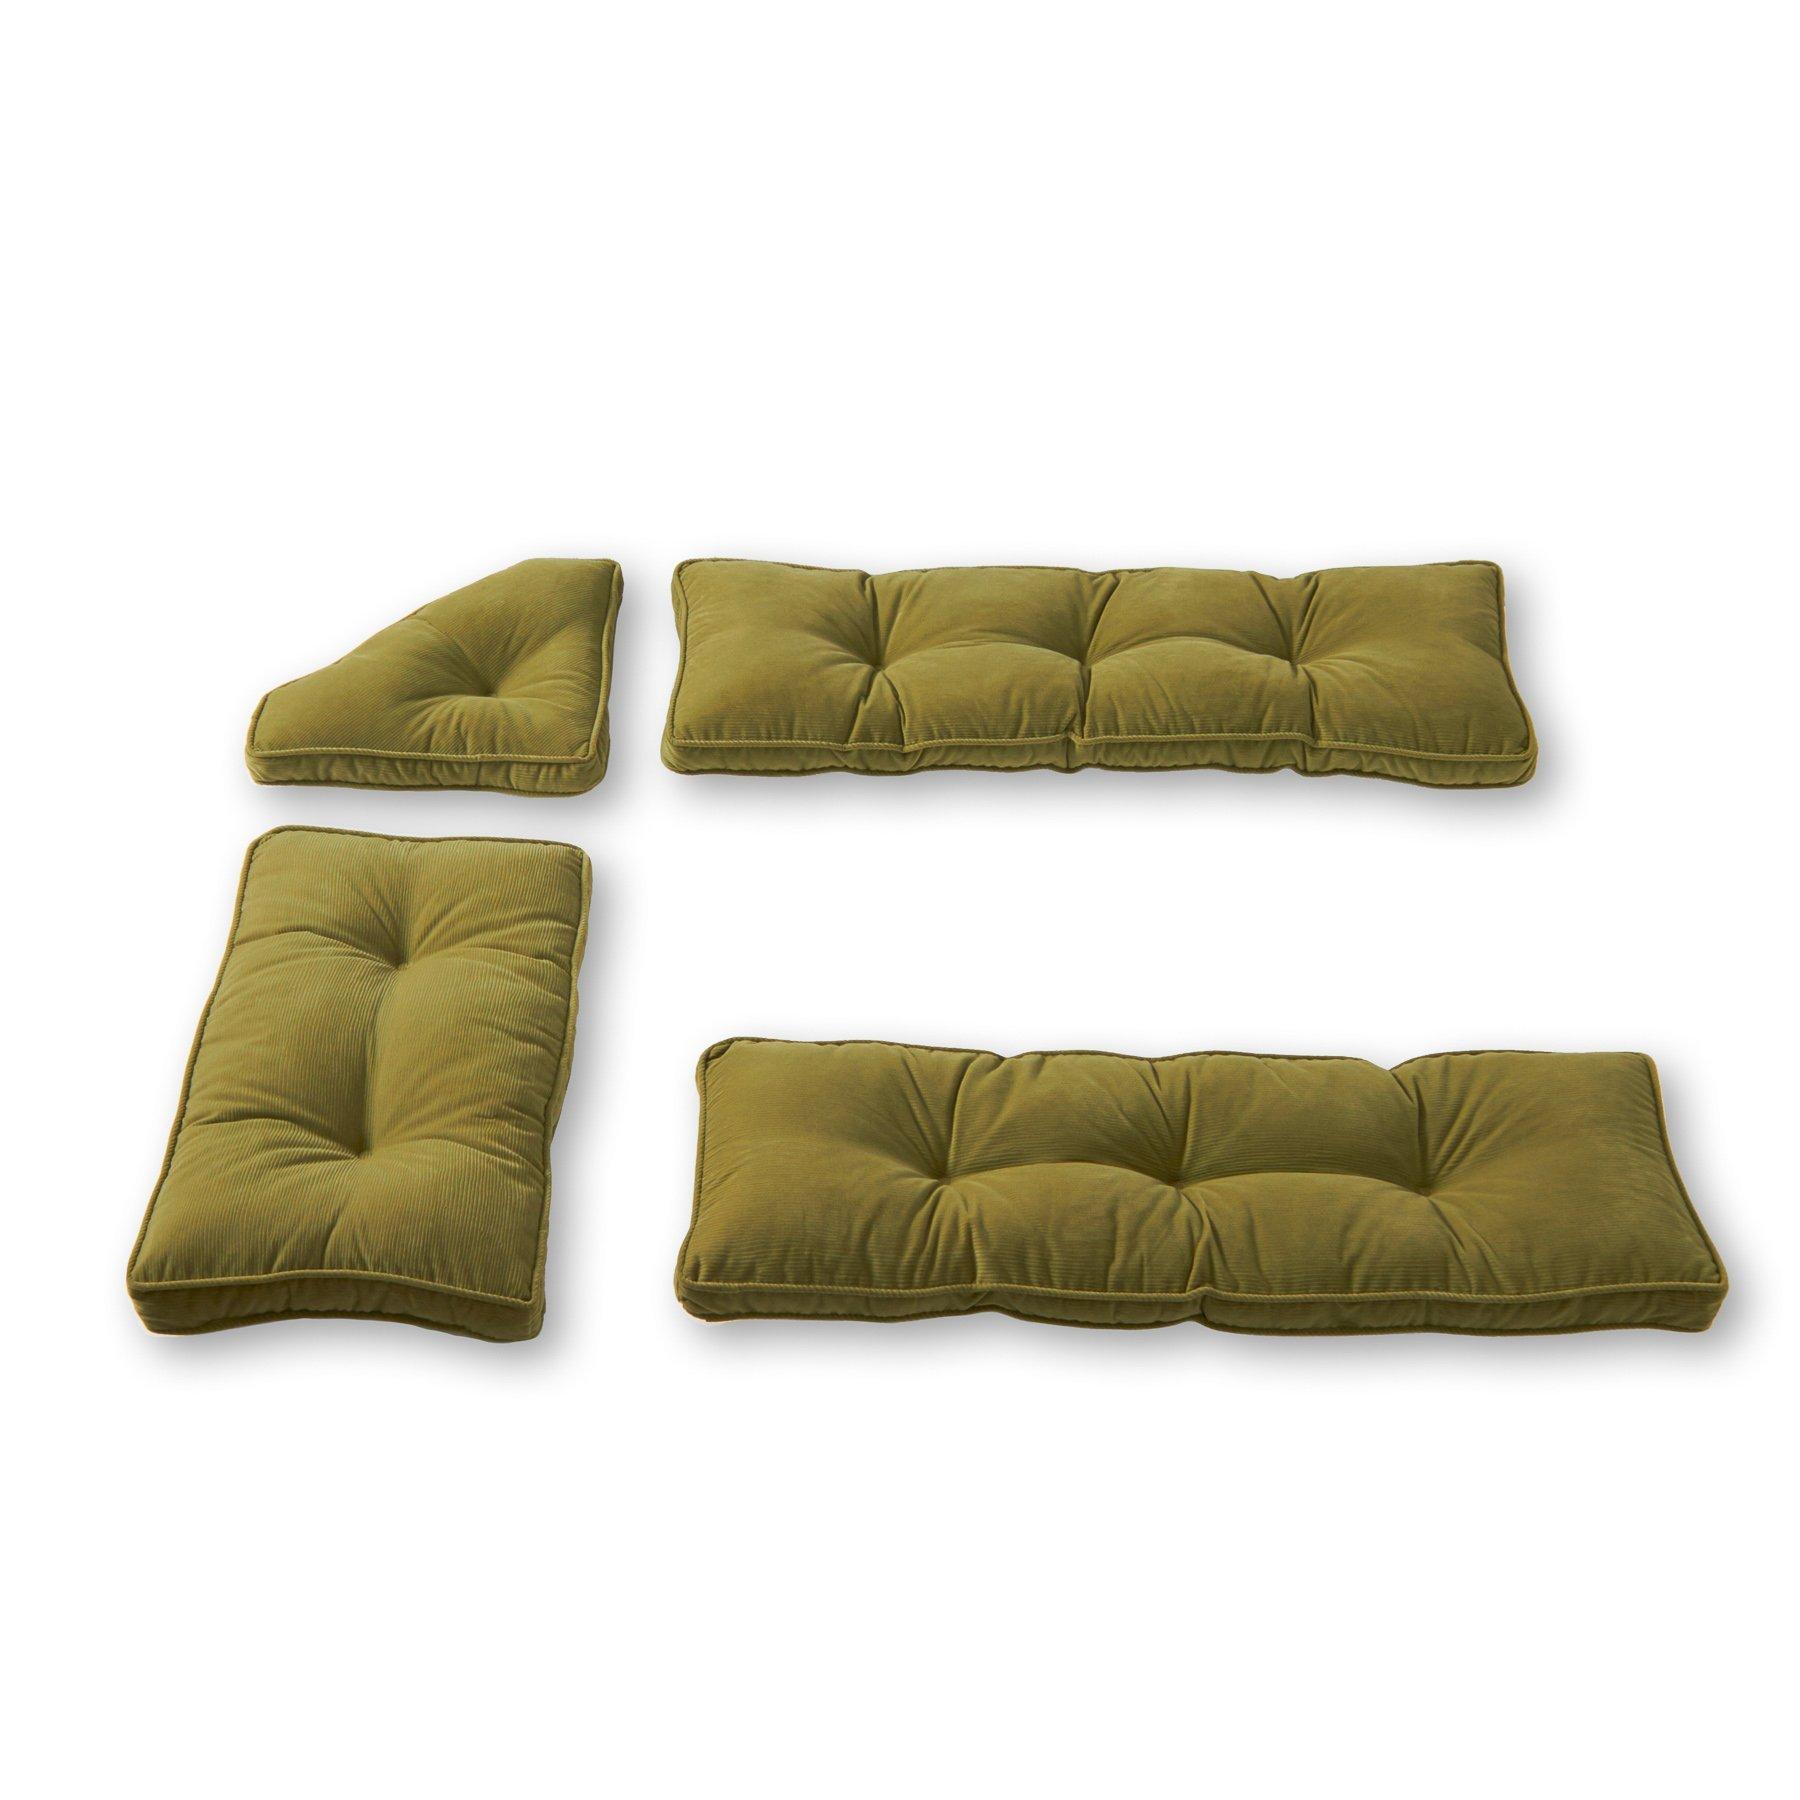 Greendale Home Fashions Nook Cushion Set, Olive Green, Pack of 4. by Greendale Home Fashions